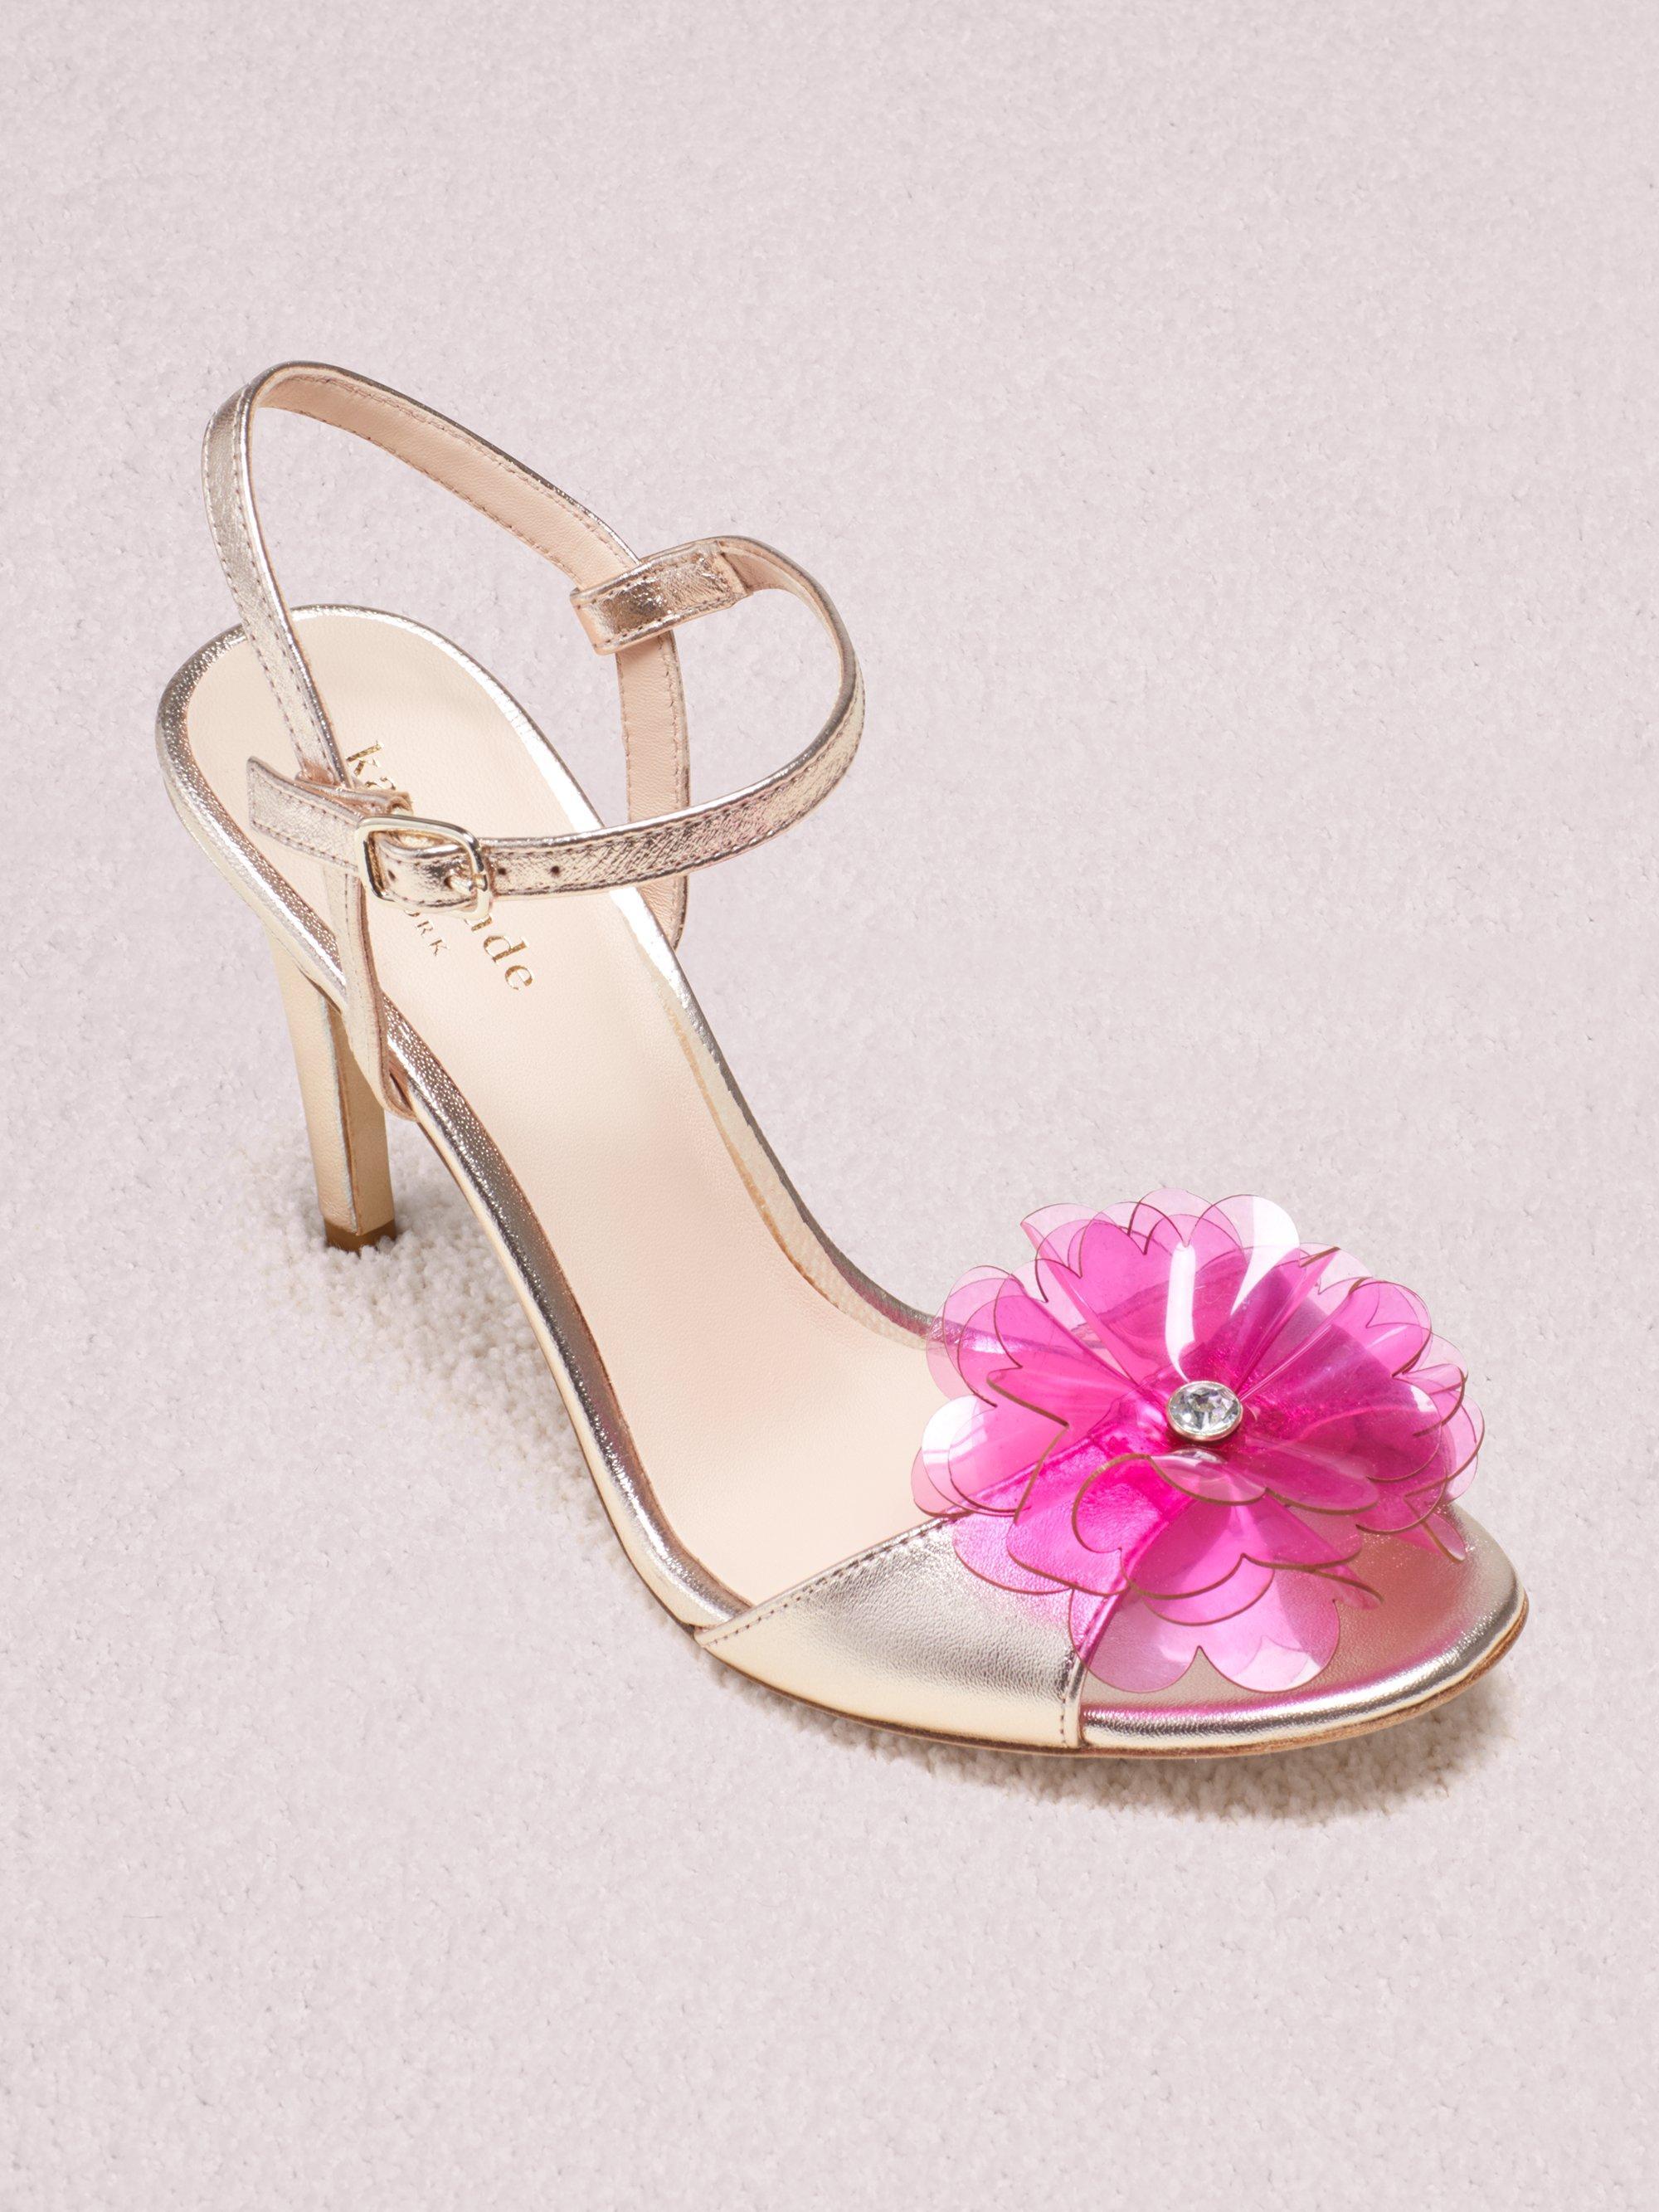 6bda4177b0be Lyst - Kate Spade Giulia Sandals in Pink